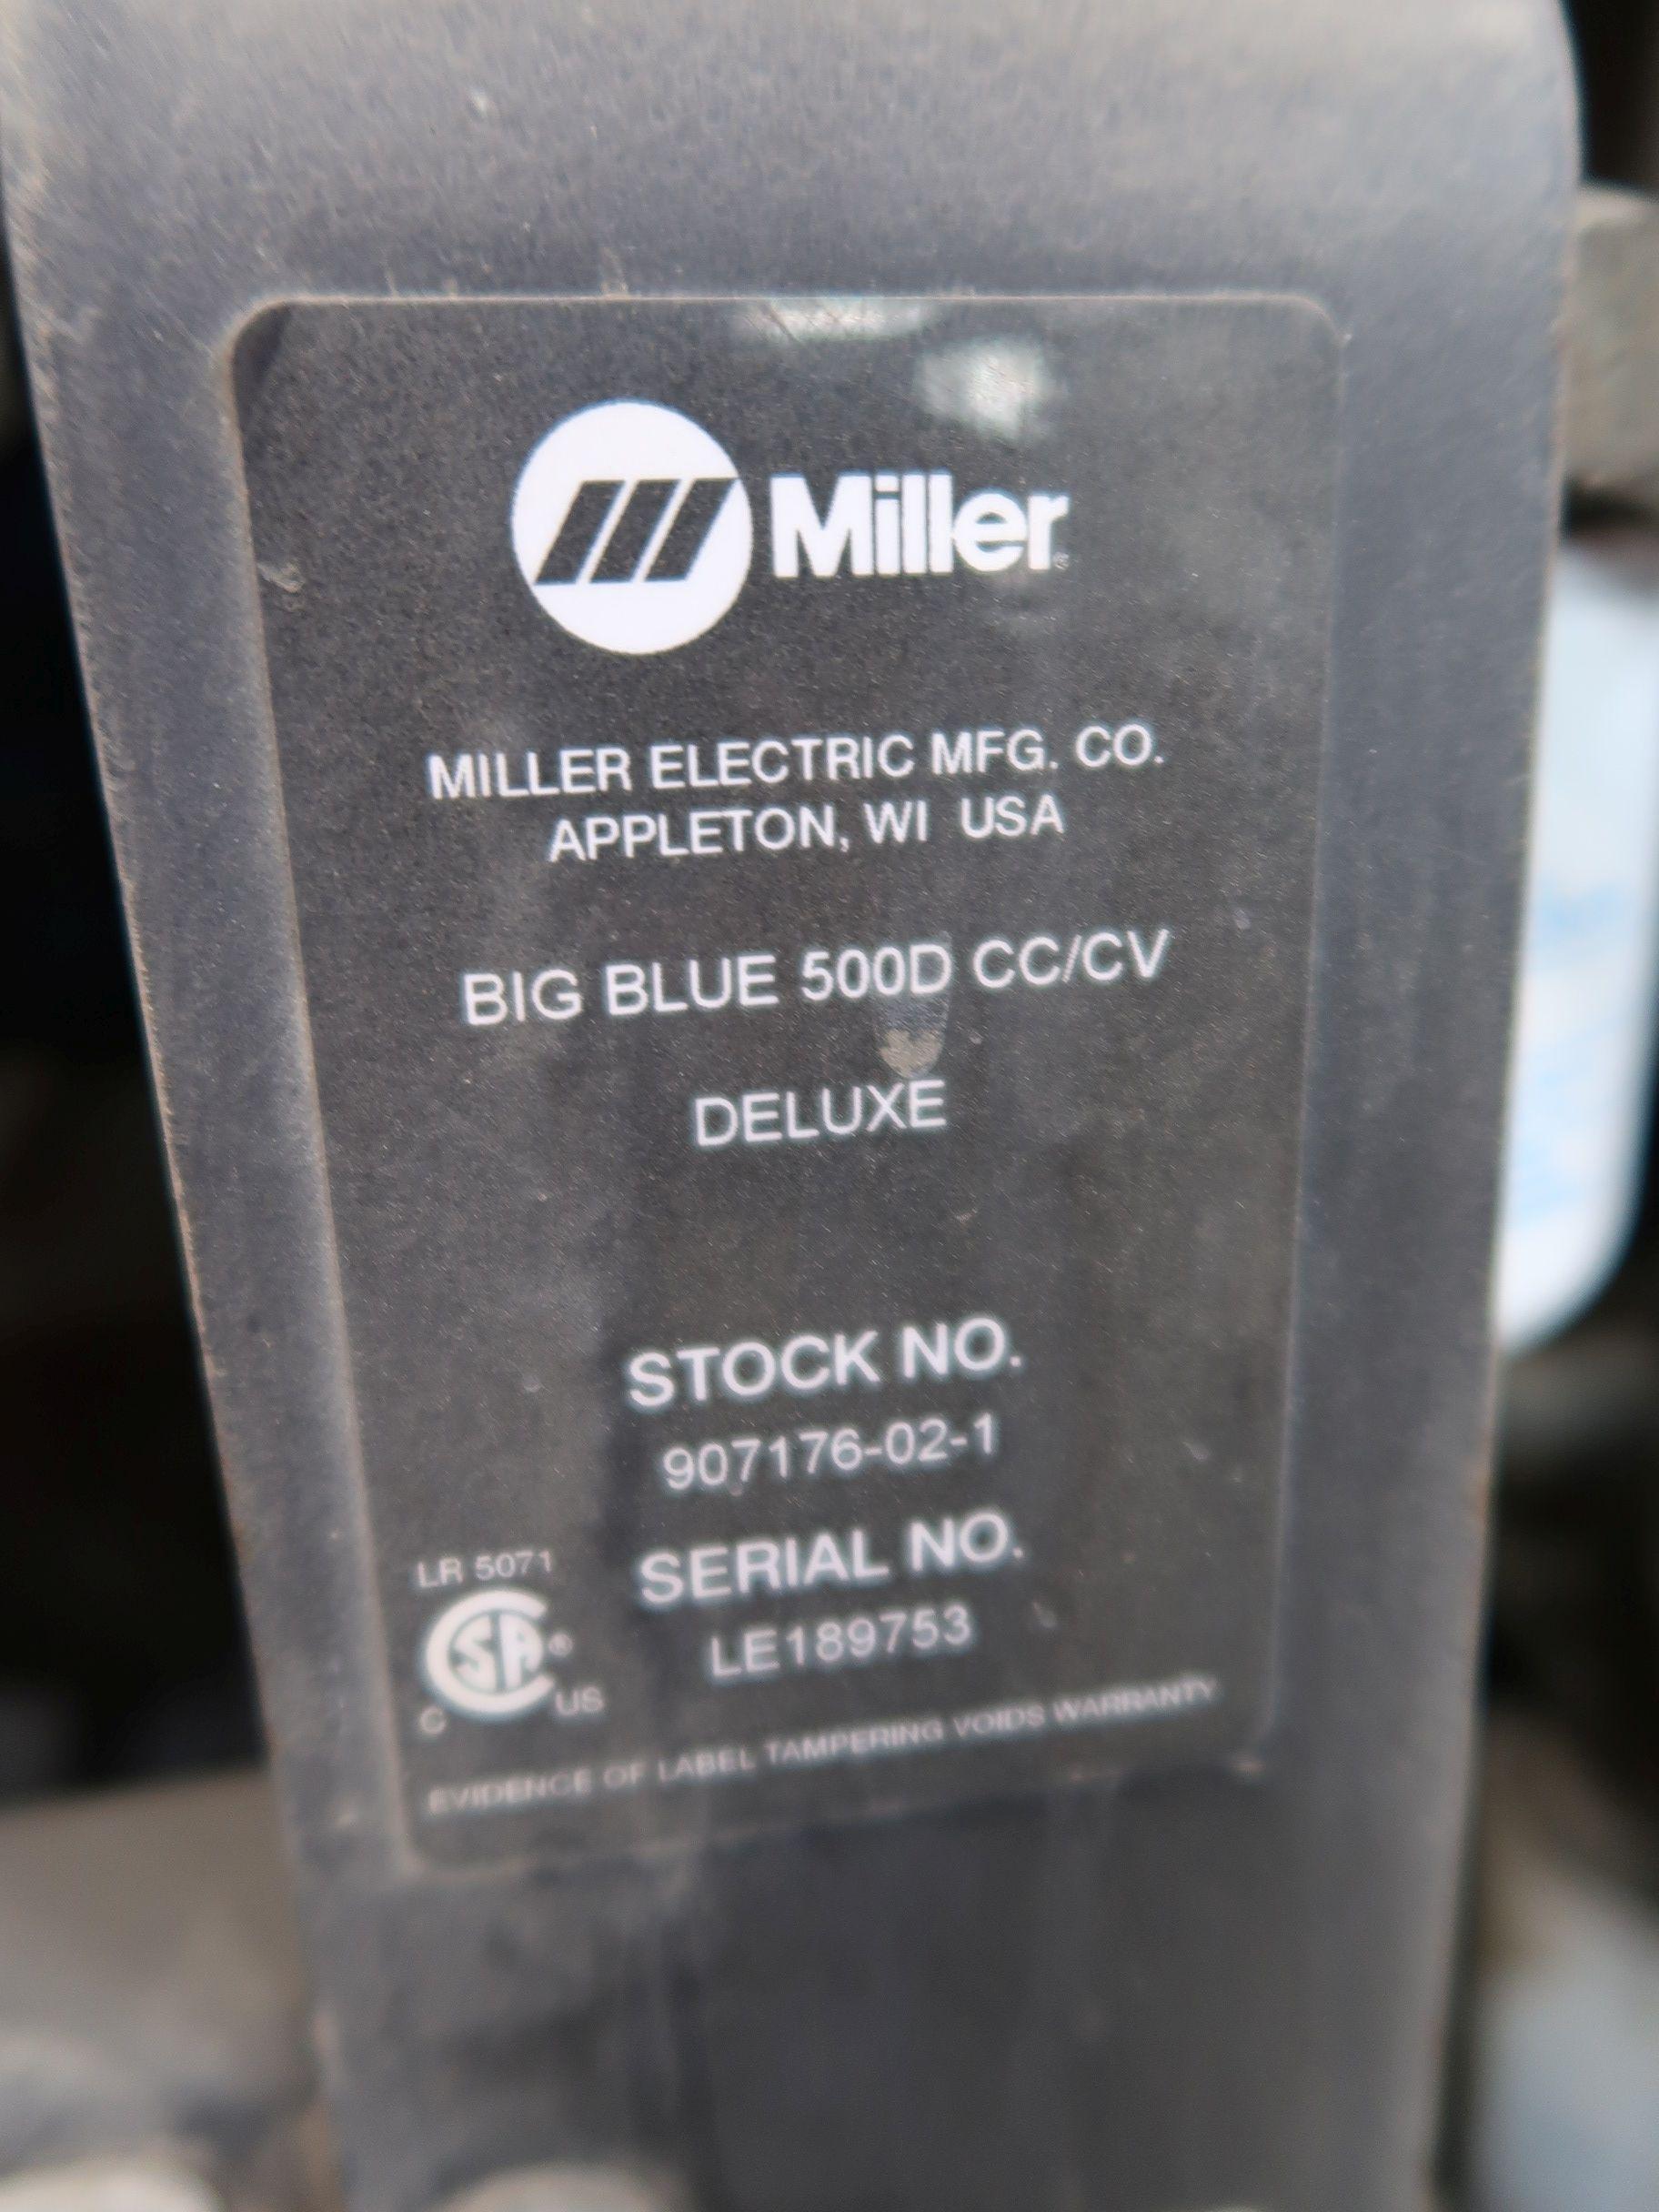 Lot 97 - MILLER MODEL BIG BLUE 500D TRAILER MOUNT DC WELDING / GENERATOR, 5,334 HOURS SHOWING; S/N LE189753